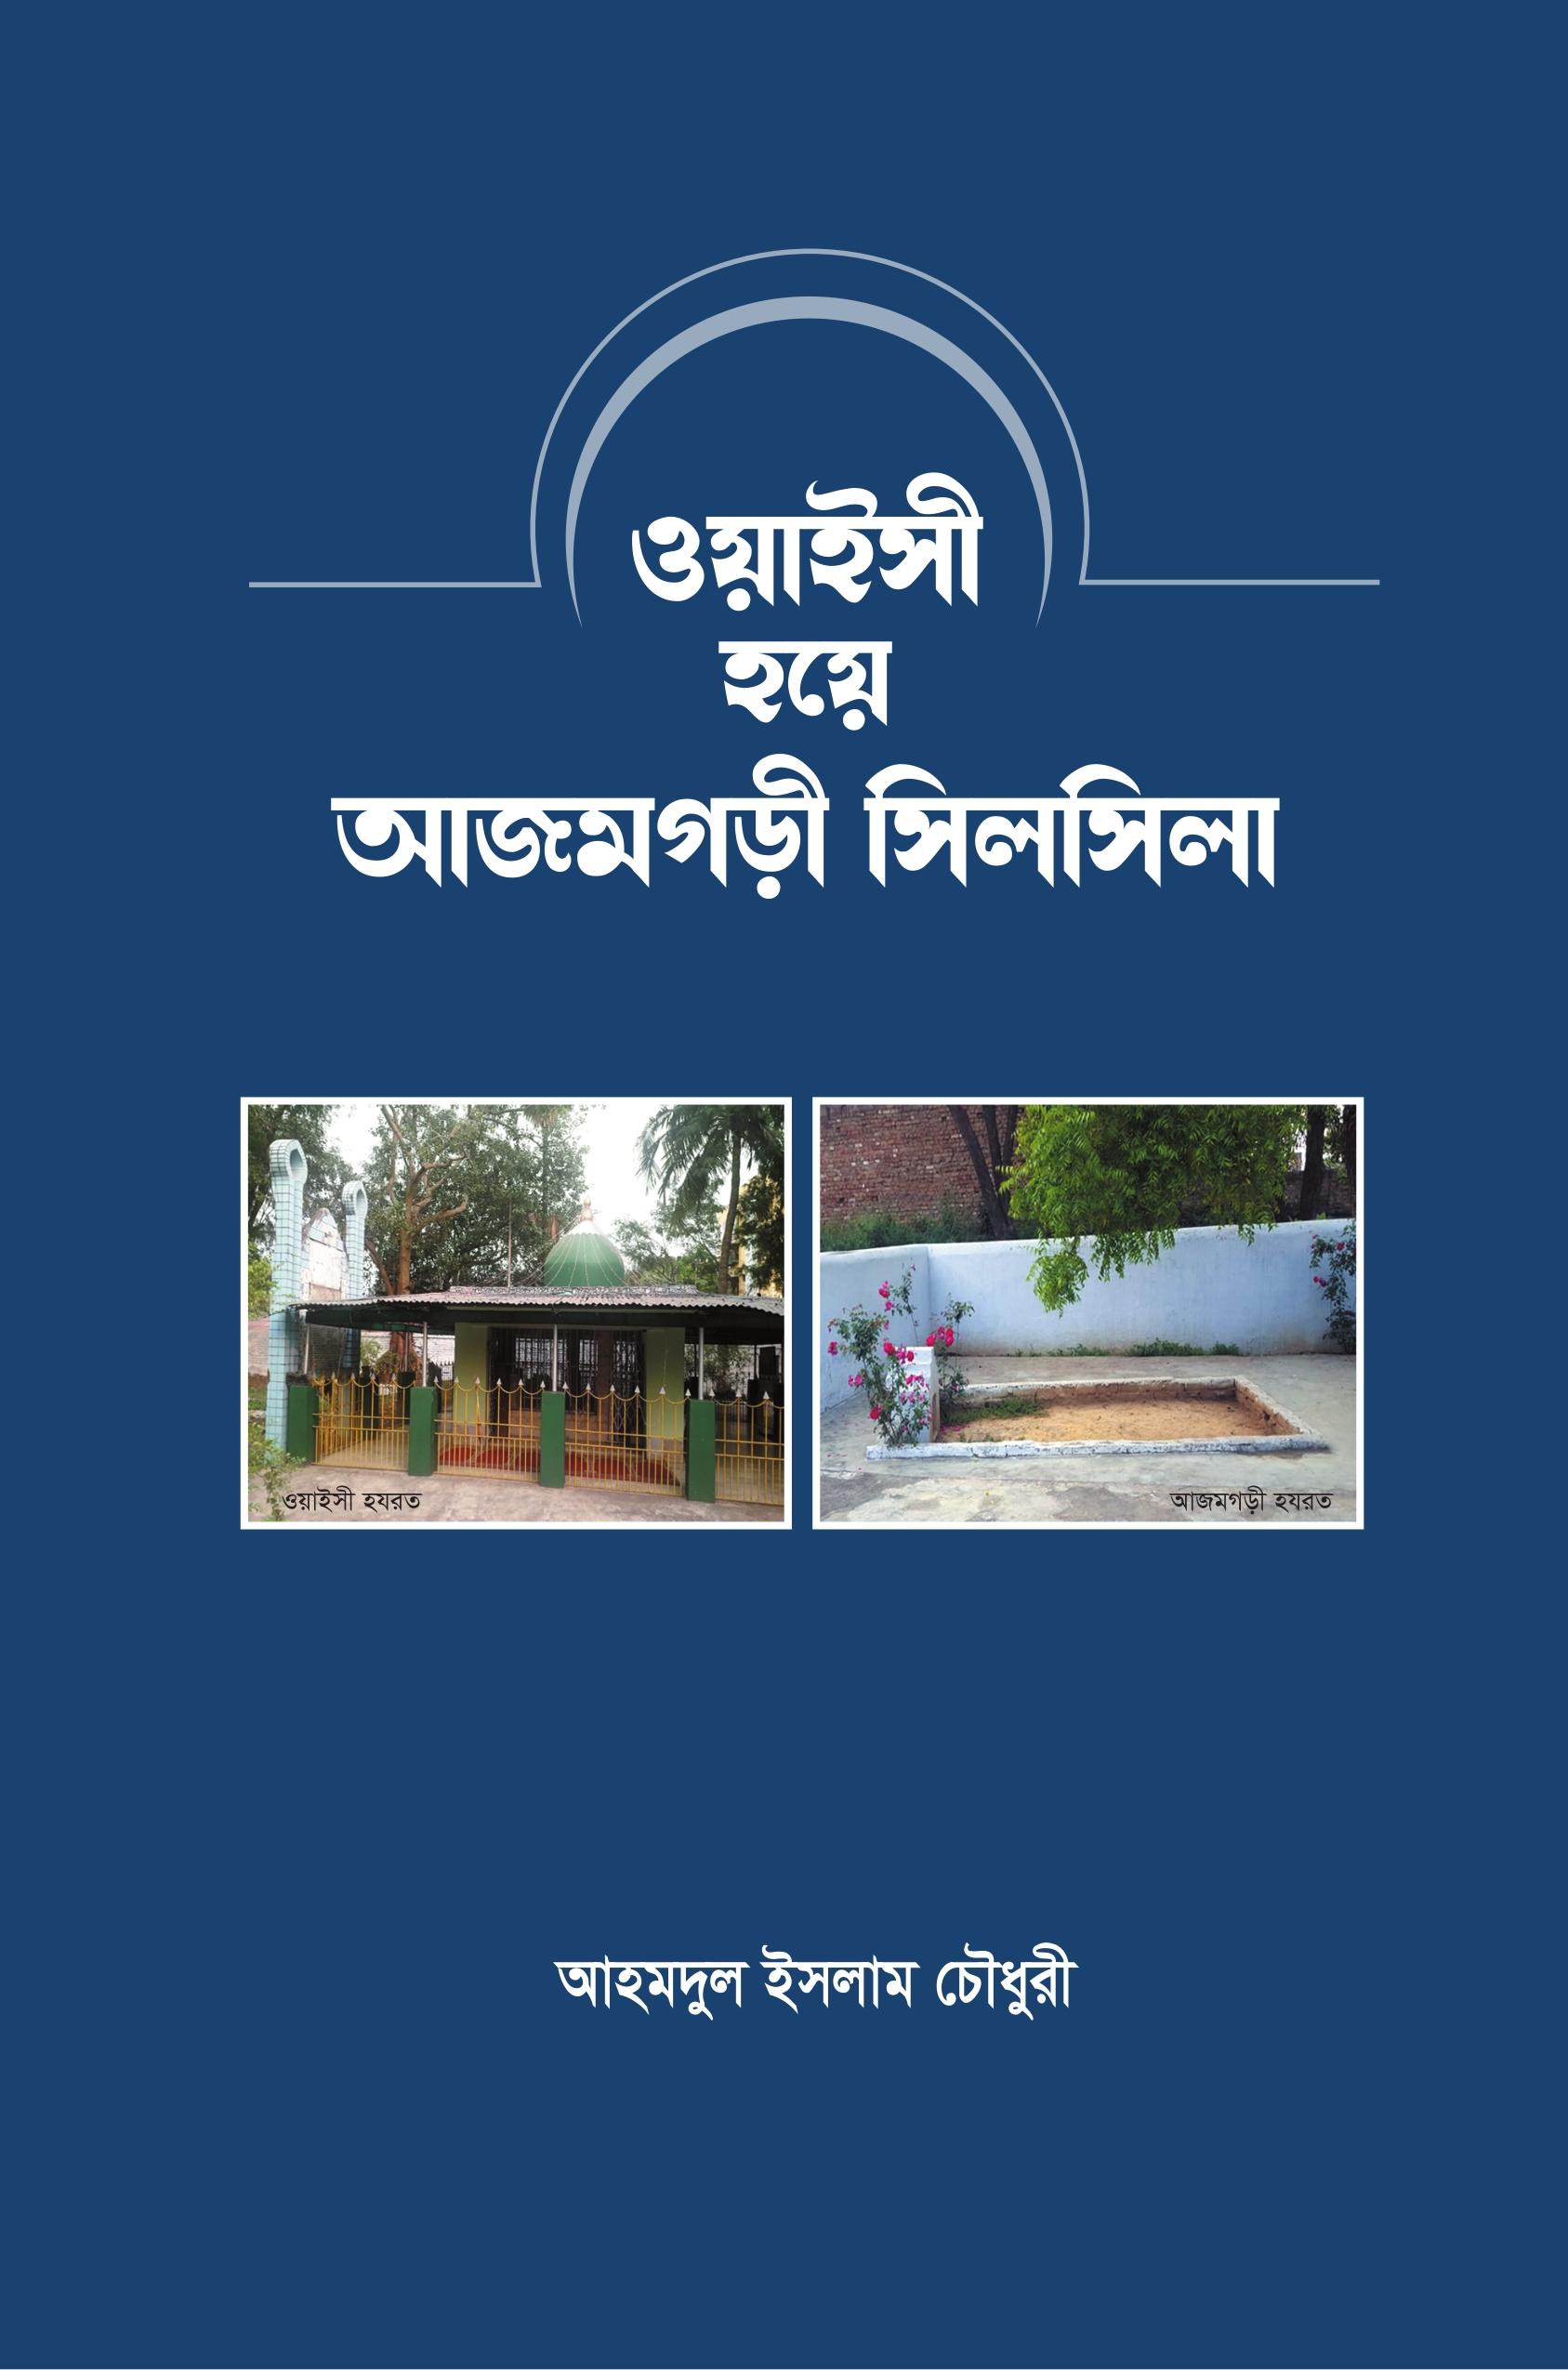 OIC PDF-2021_single_001